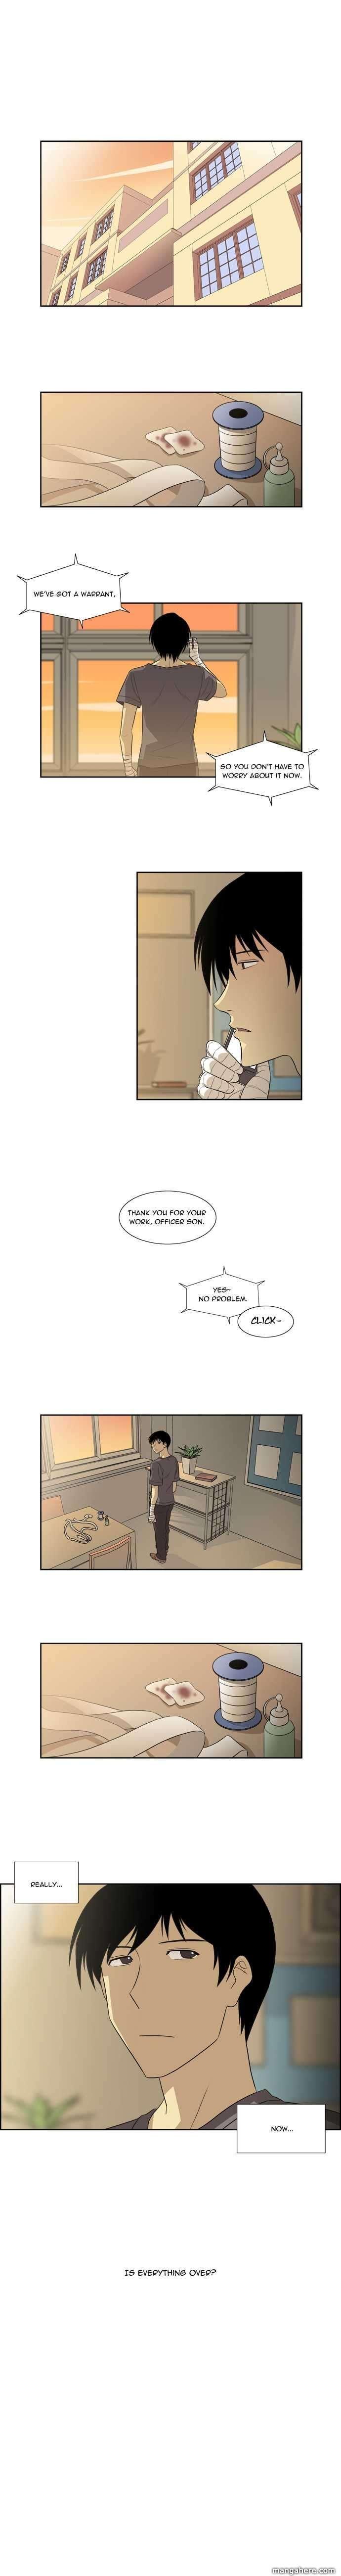 Melo Holic 38 Page 1